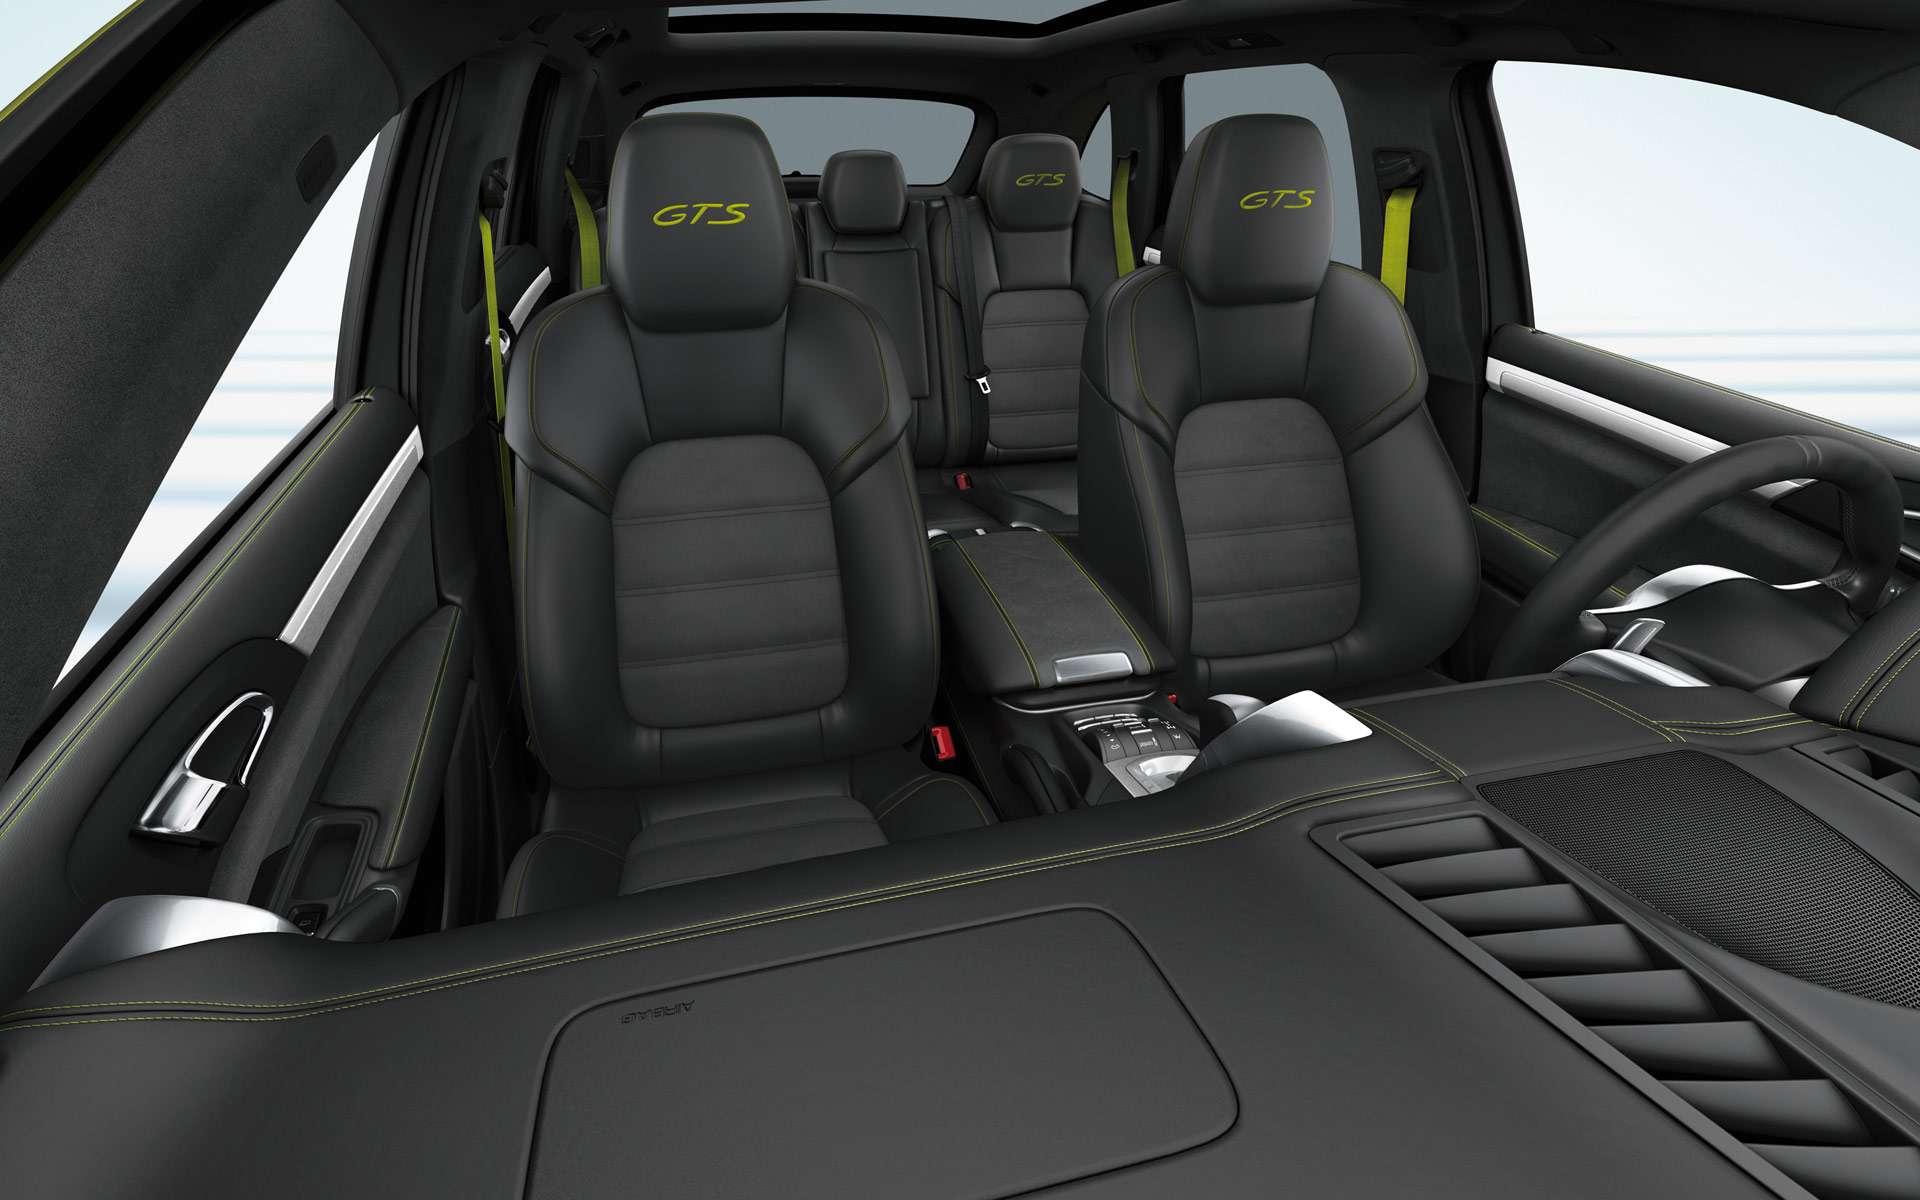 porsche cayenne gts 2012 k l nleges aut k. Black Bedroom Furniture Sets. Home Design Ideas